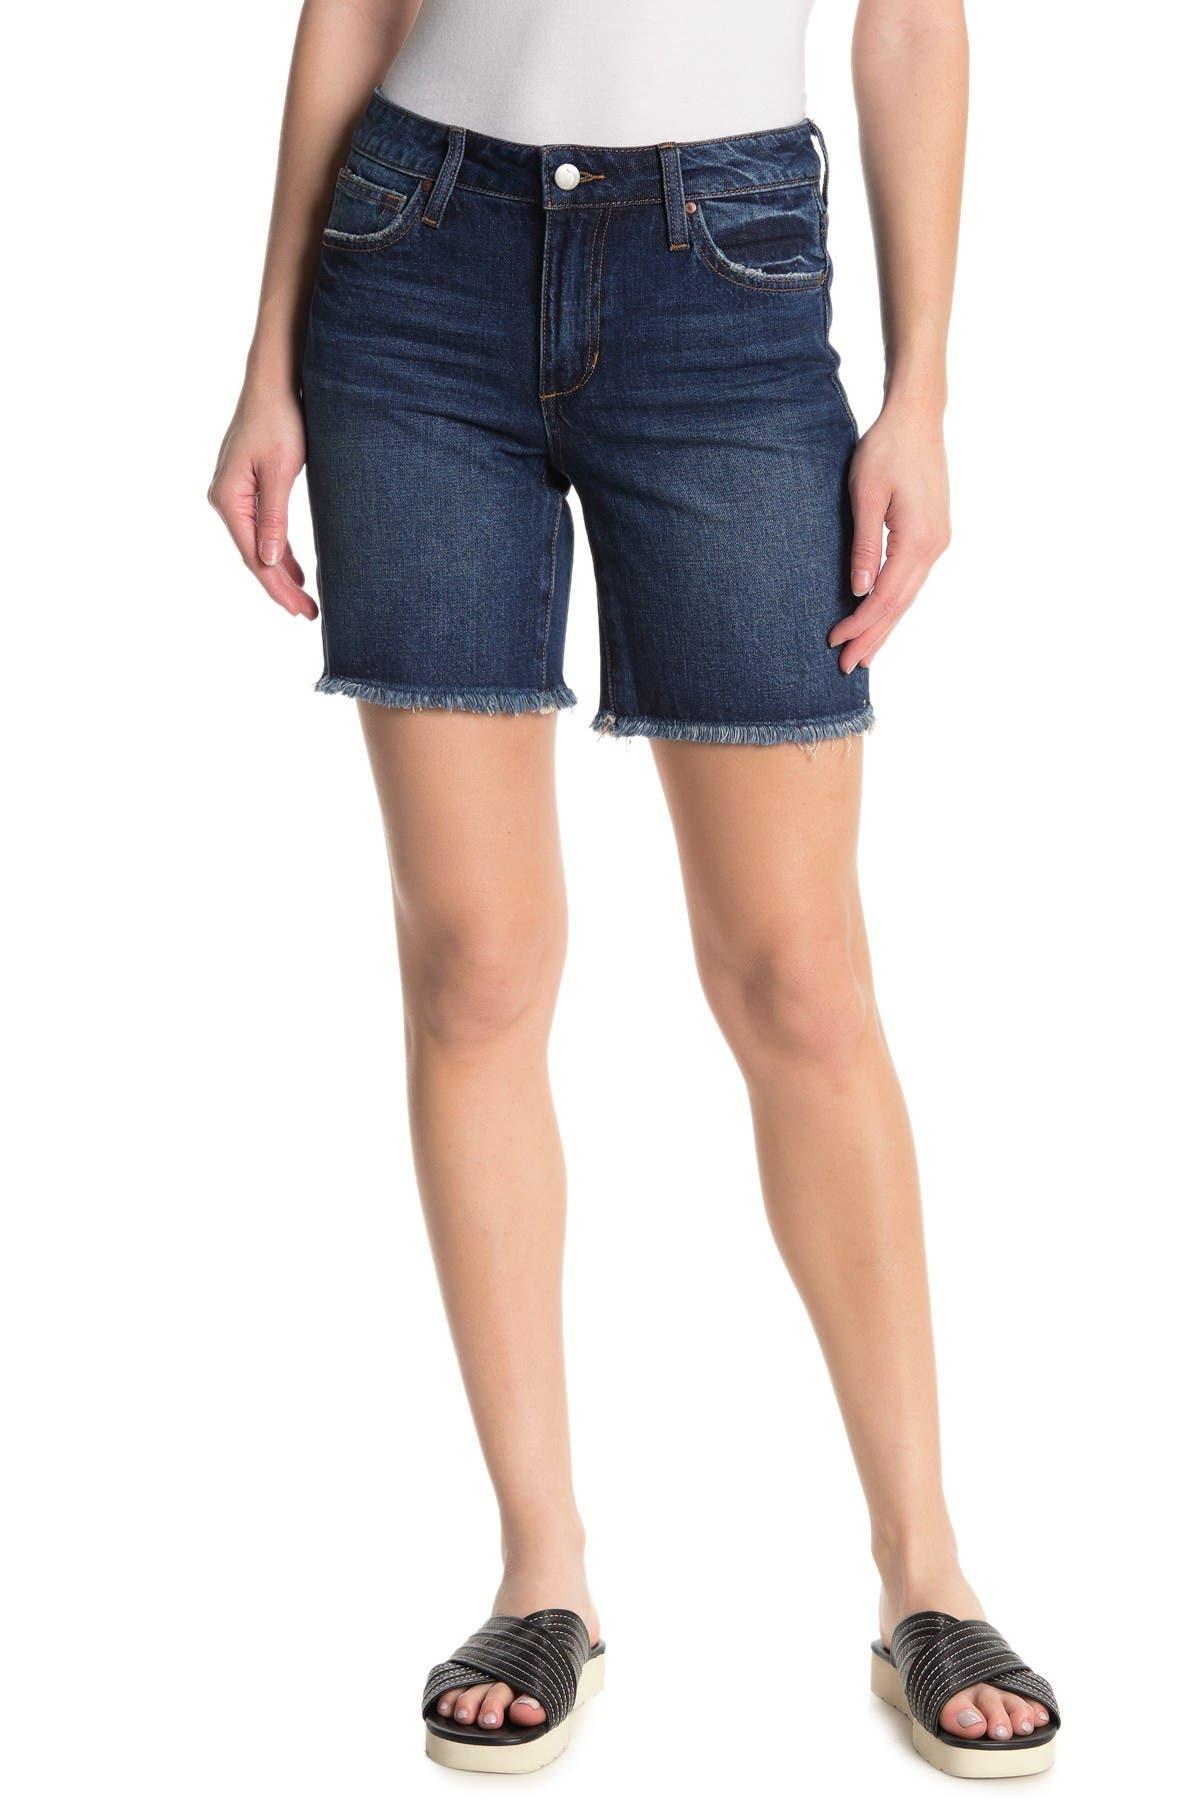 Image of Joe's Jeans Mid Rise Cutoff Bermuda Shorts